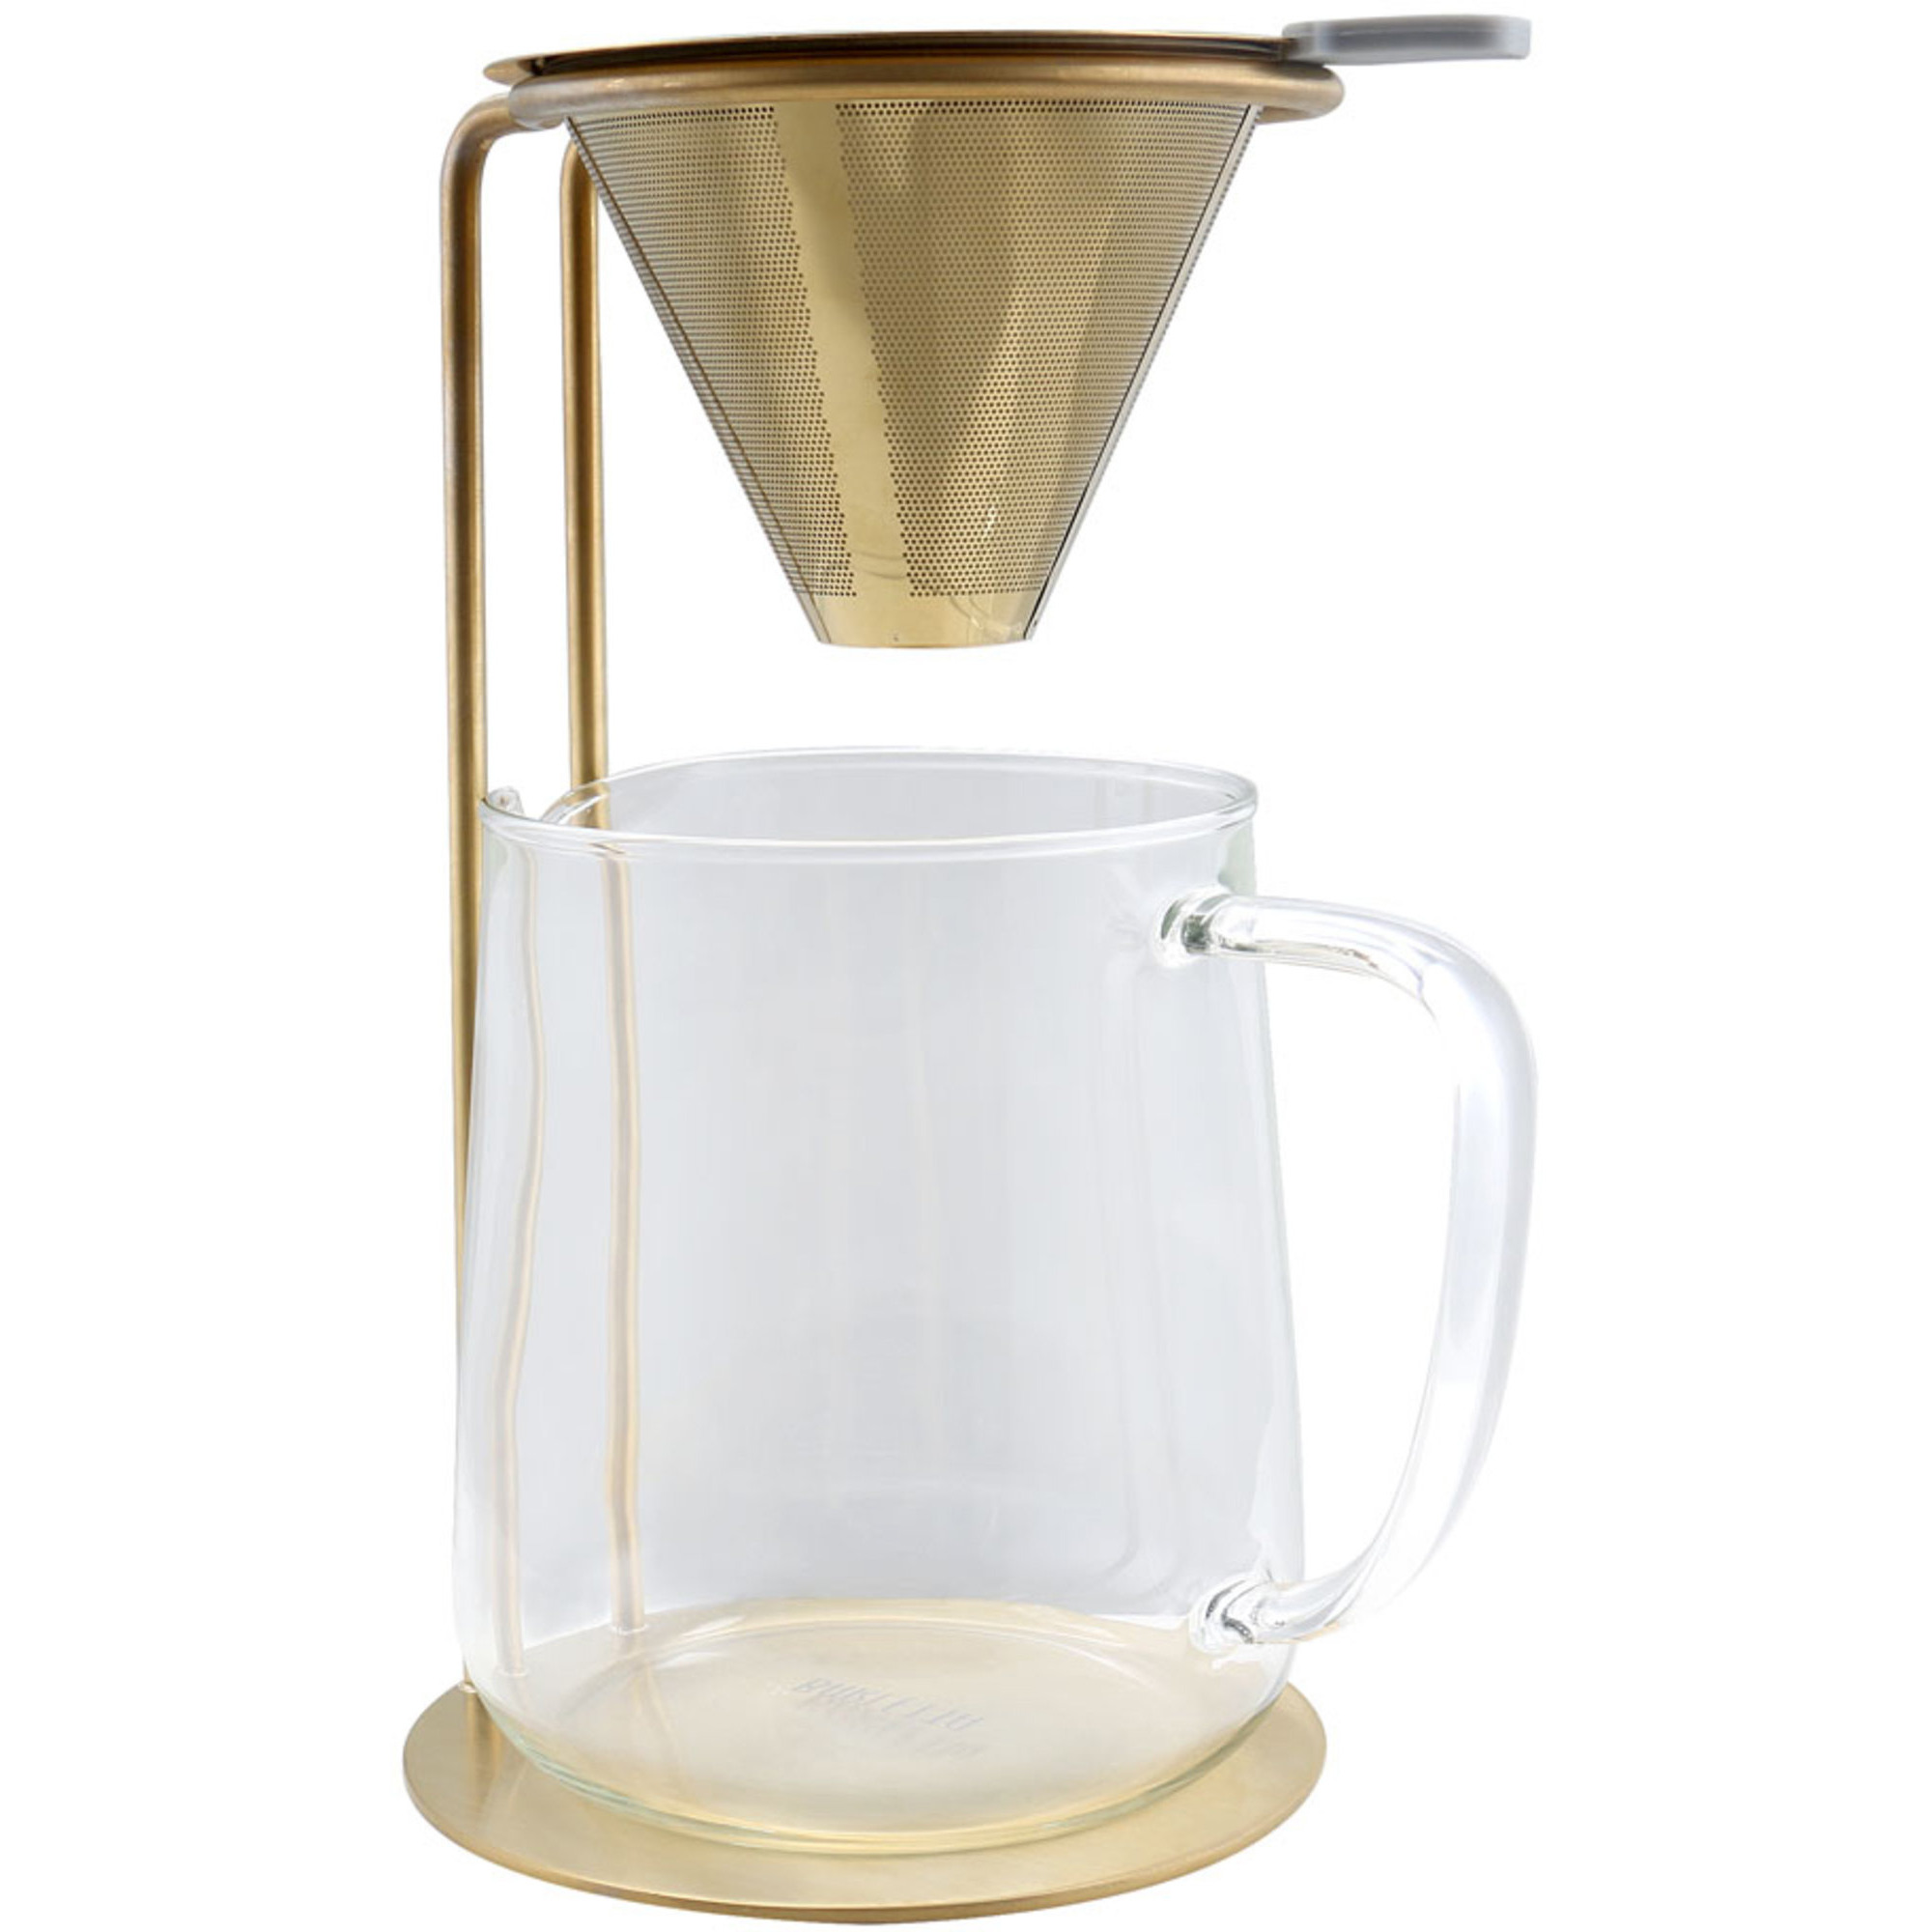 Barletta Pour Over Glaskanna med stativ